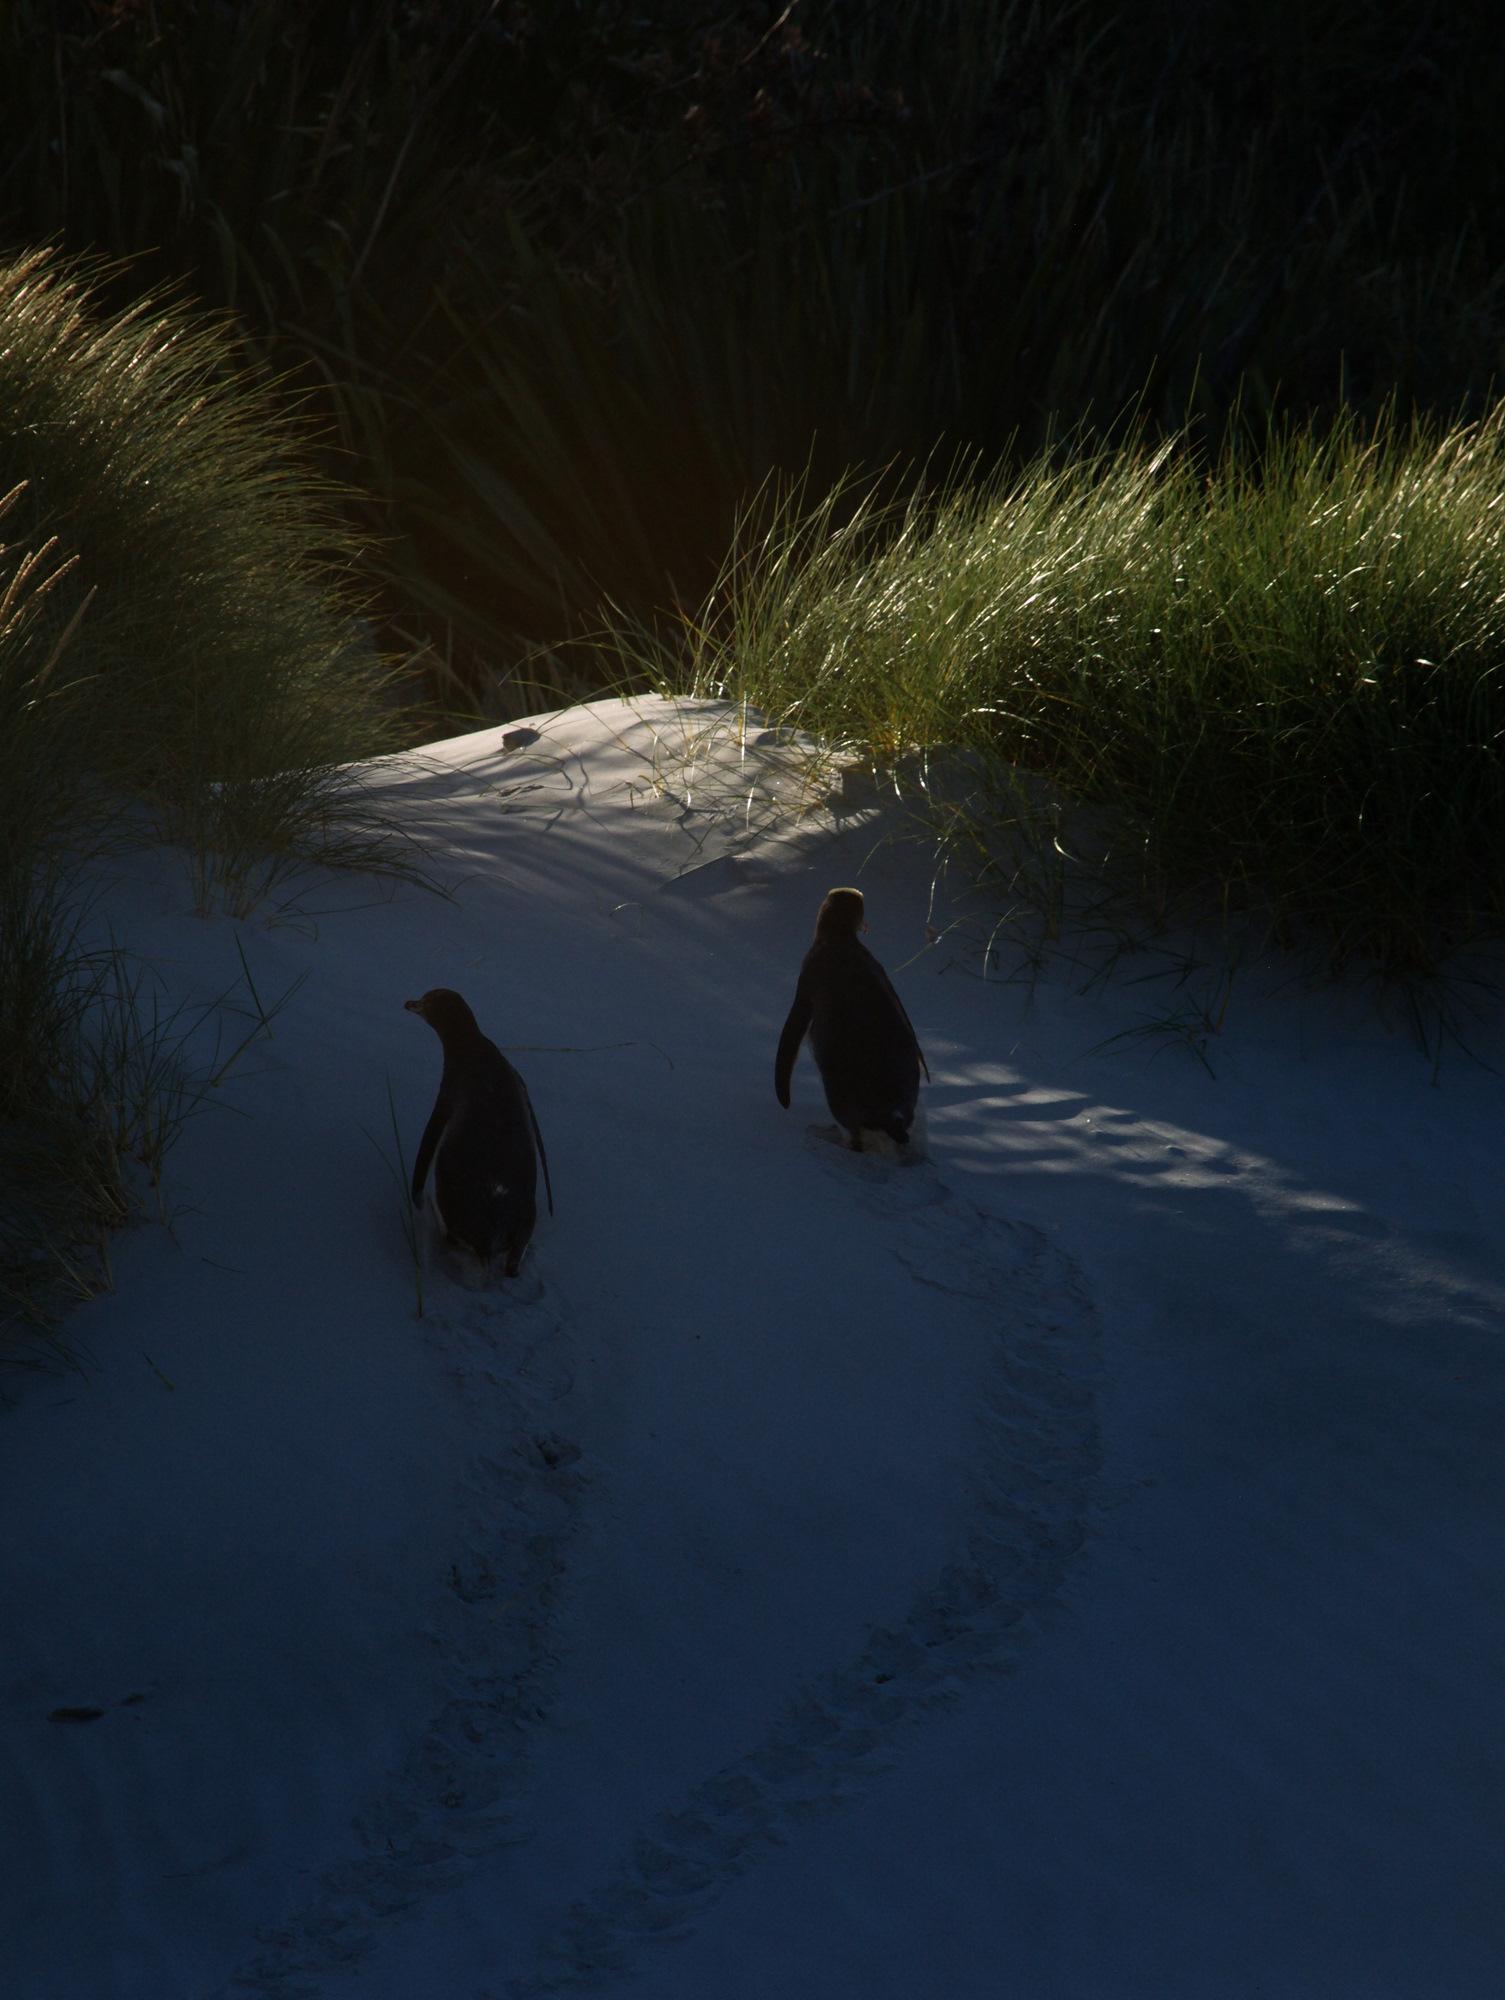 New Zealand: Parløb